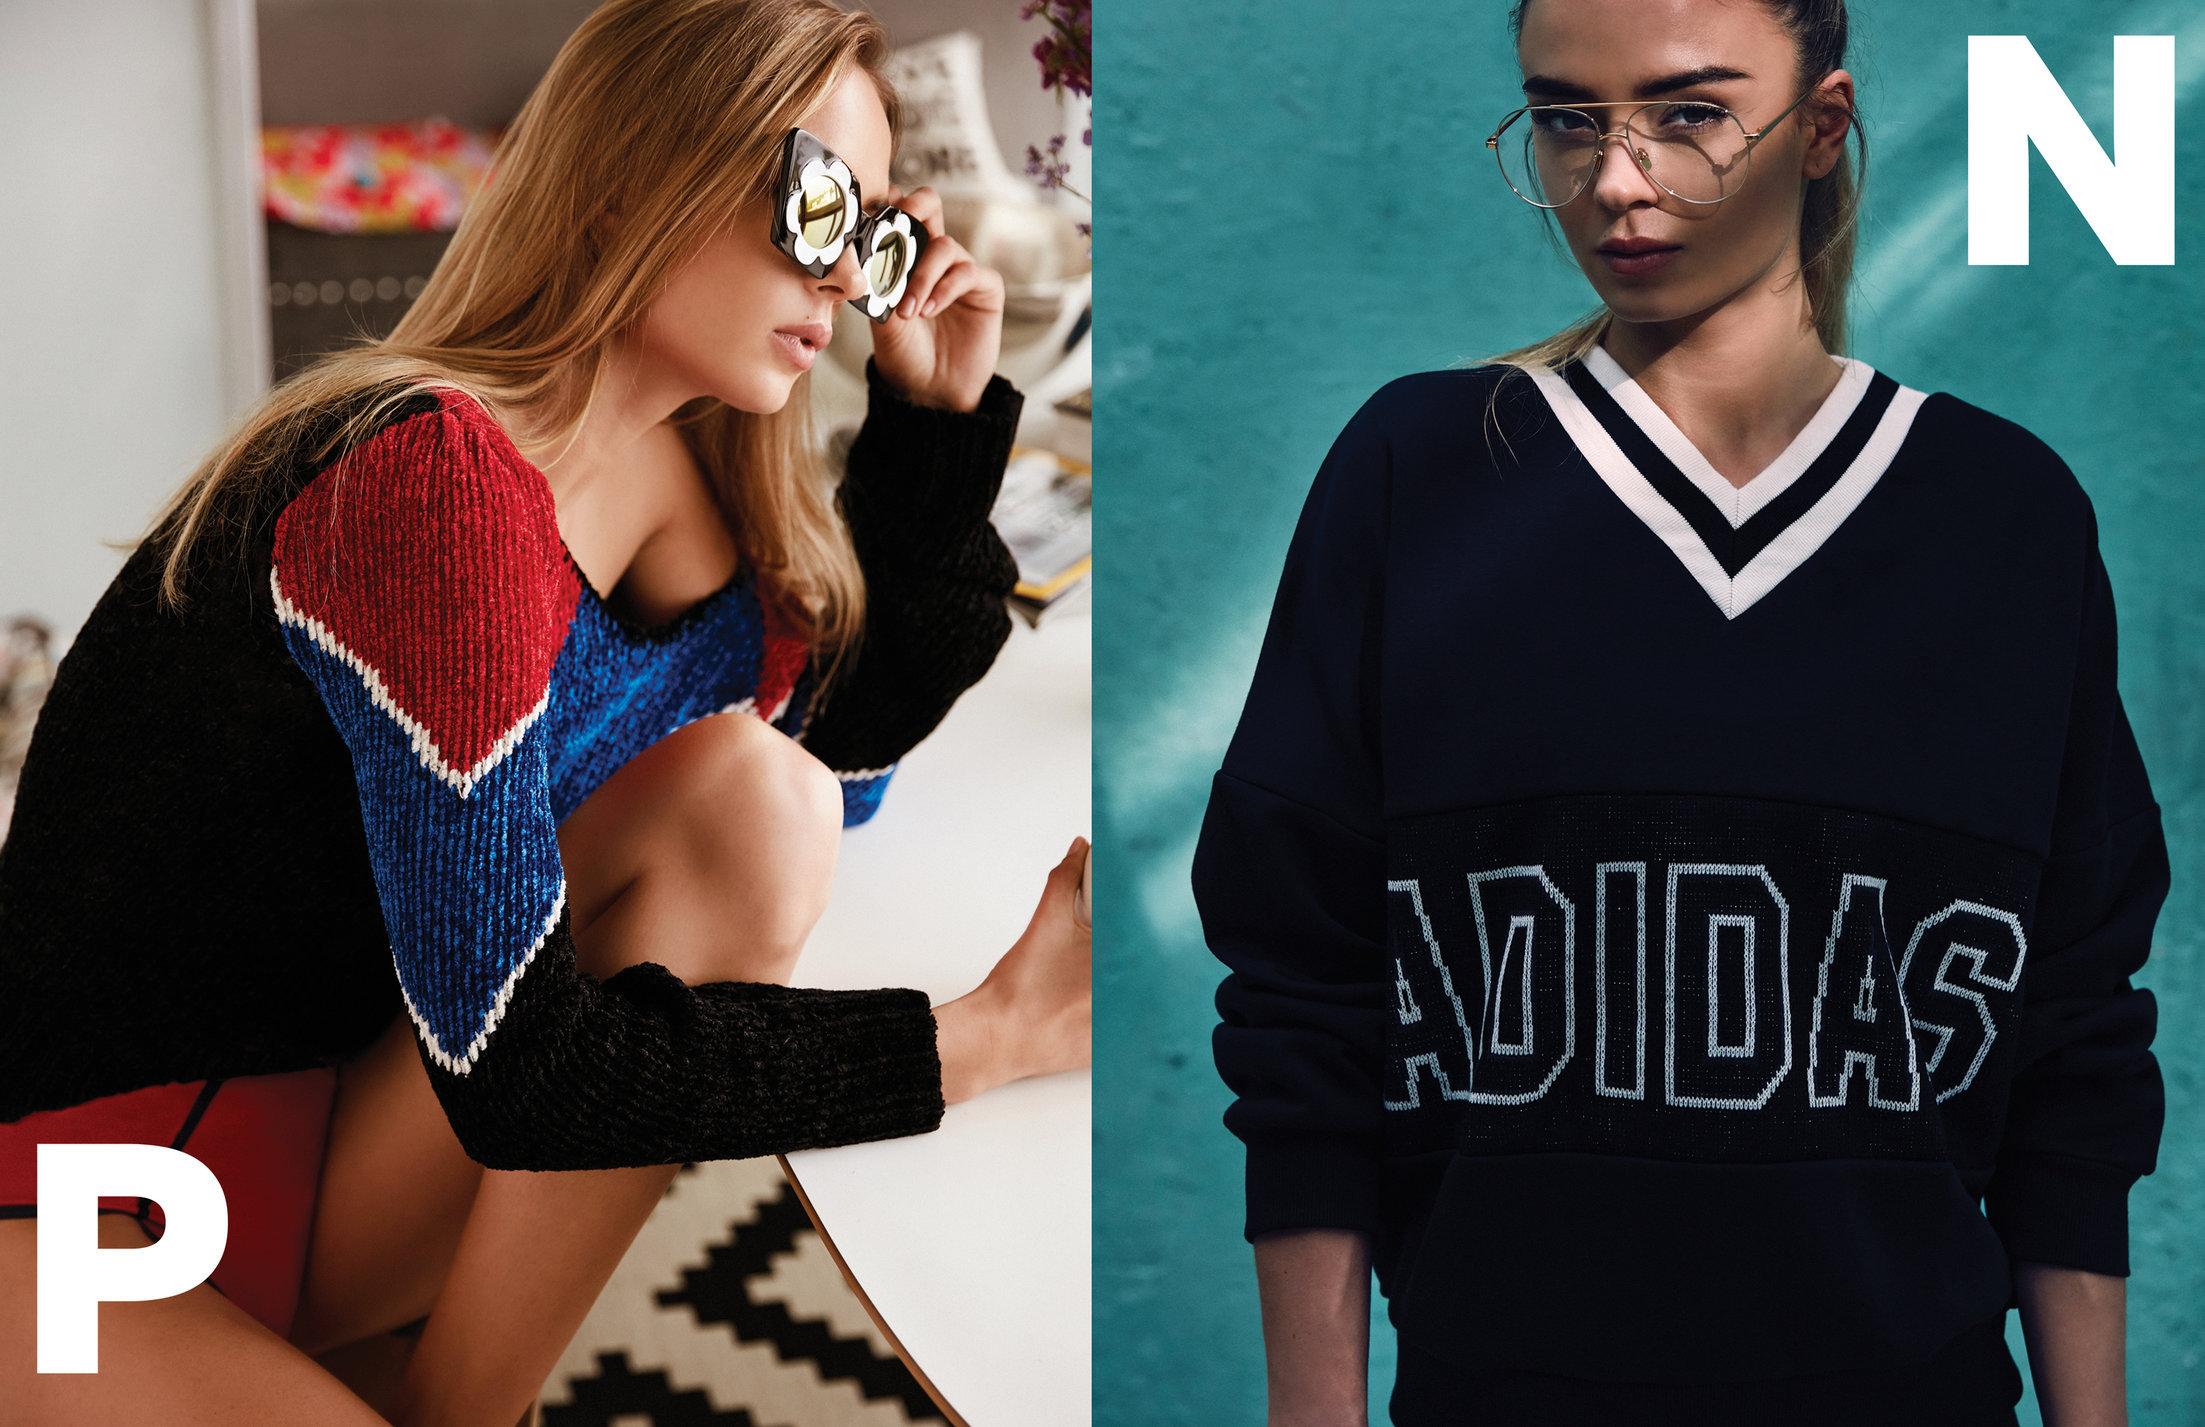 grate_das-model_nyc-sport_fashion-photographer-nico-stipcianos-miami-copy-2-marking.jpg